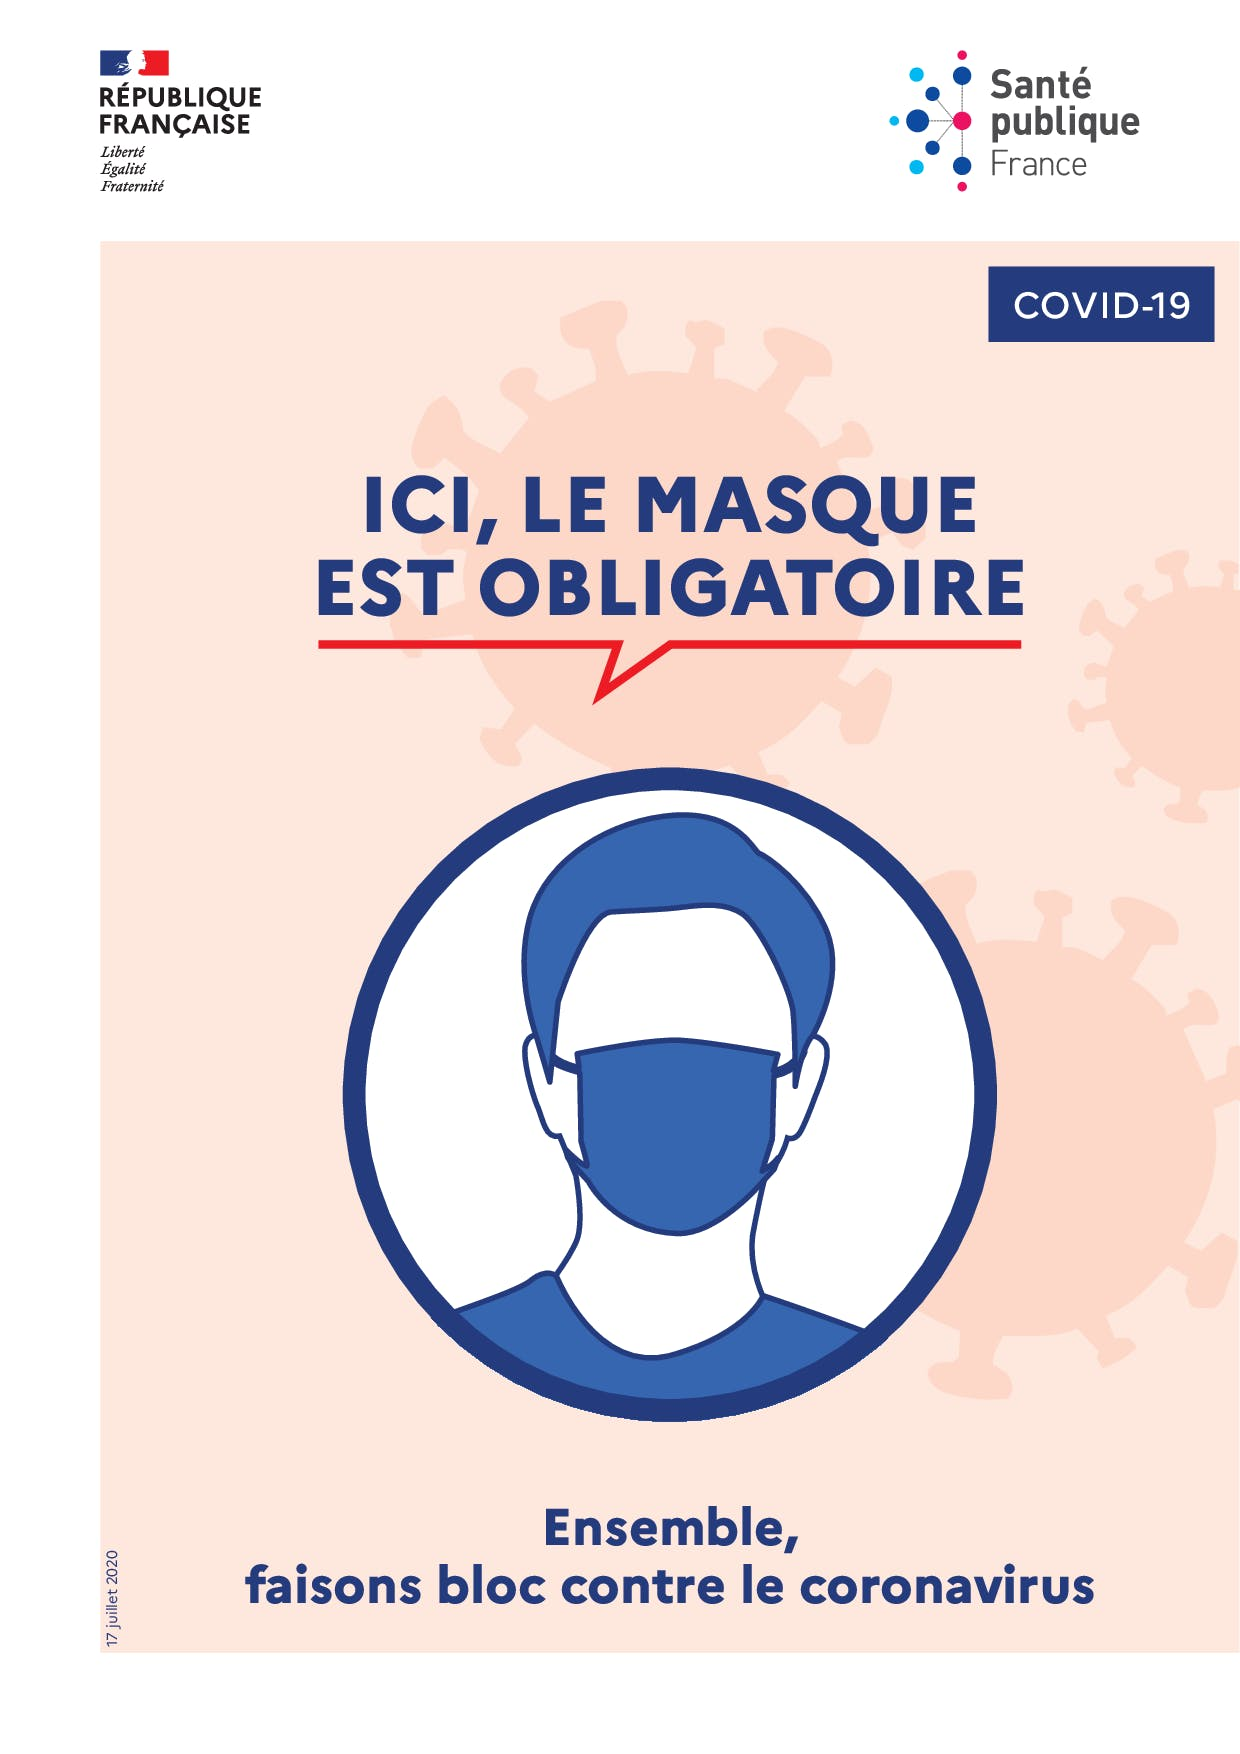 Logo du port du masque obligatoire